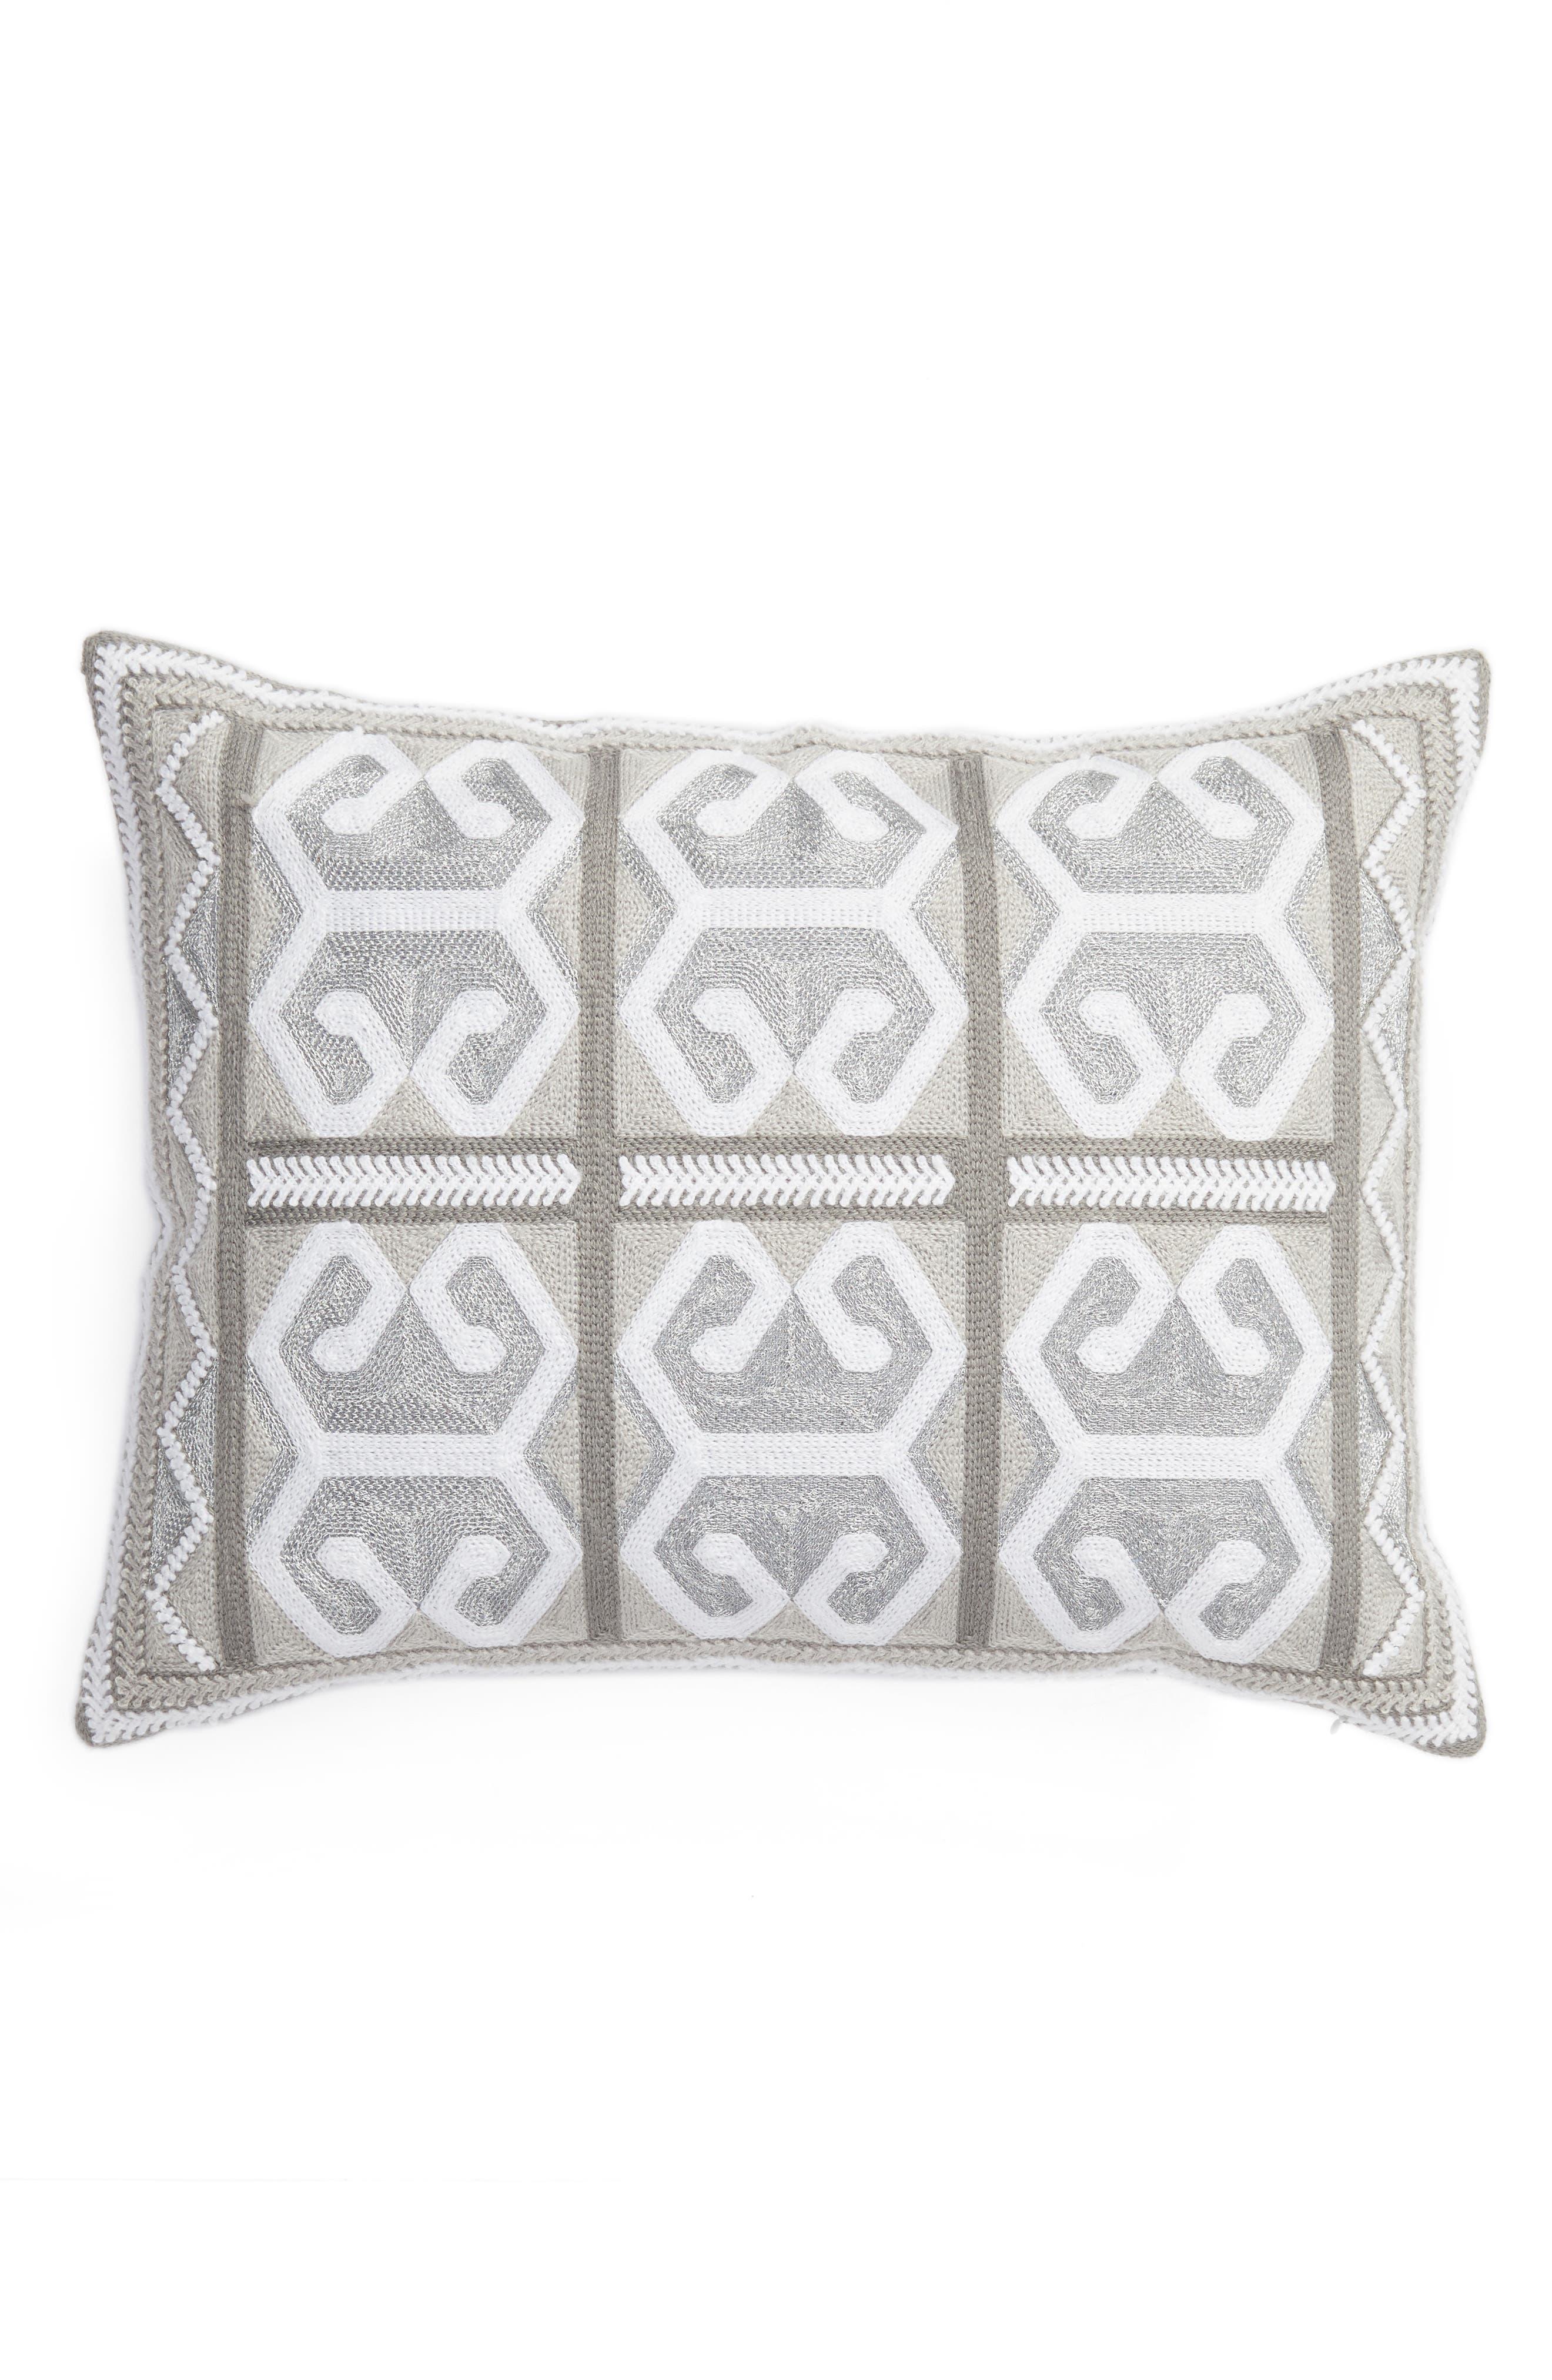 Main Image - Levtex Caleb Crewel Stitch Accent Pillow